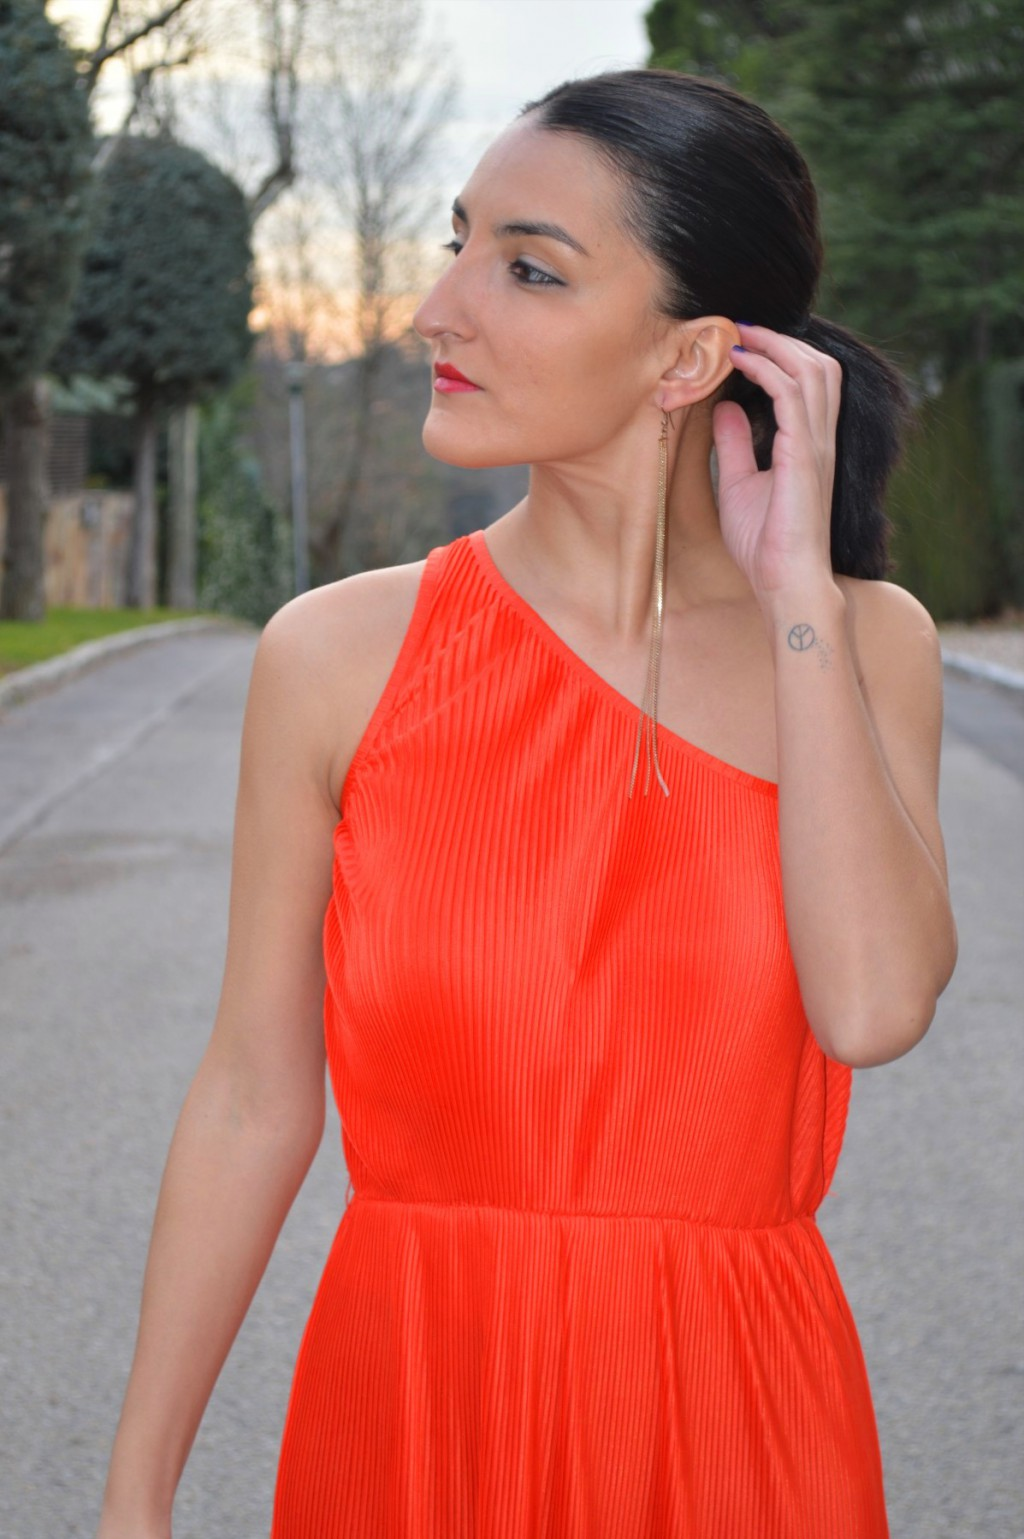 Vestido / dress: Primark (old) Pendiente / earring: Parfois